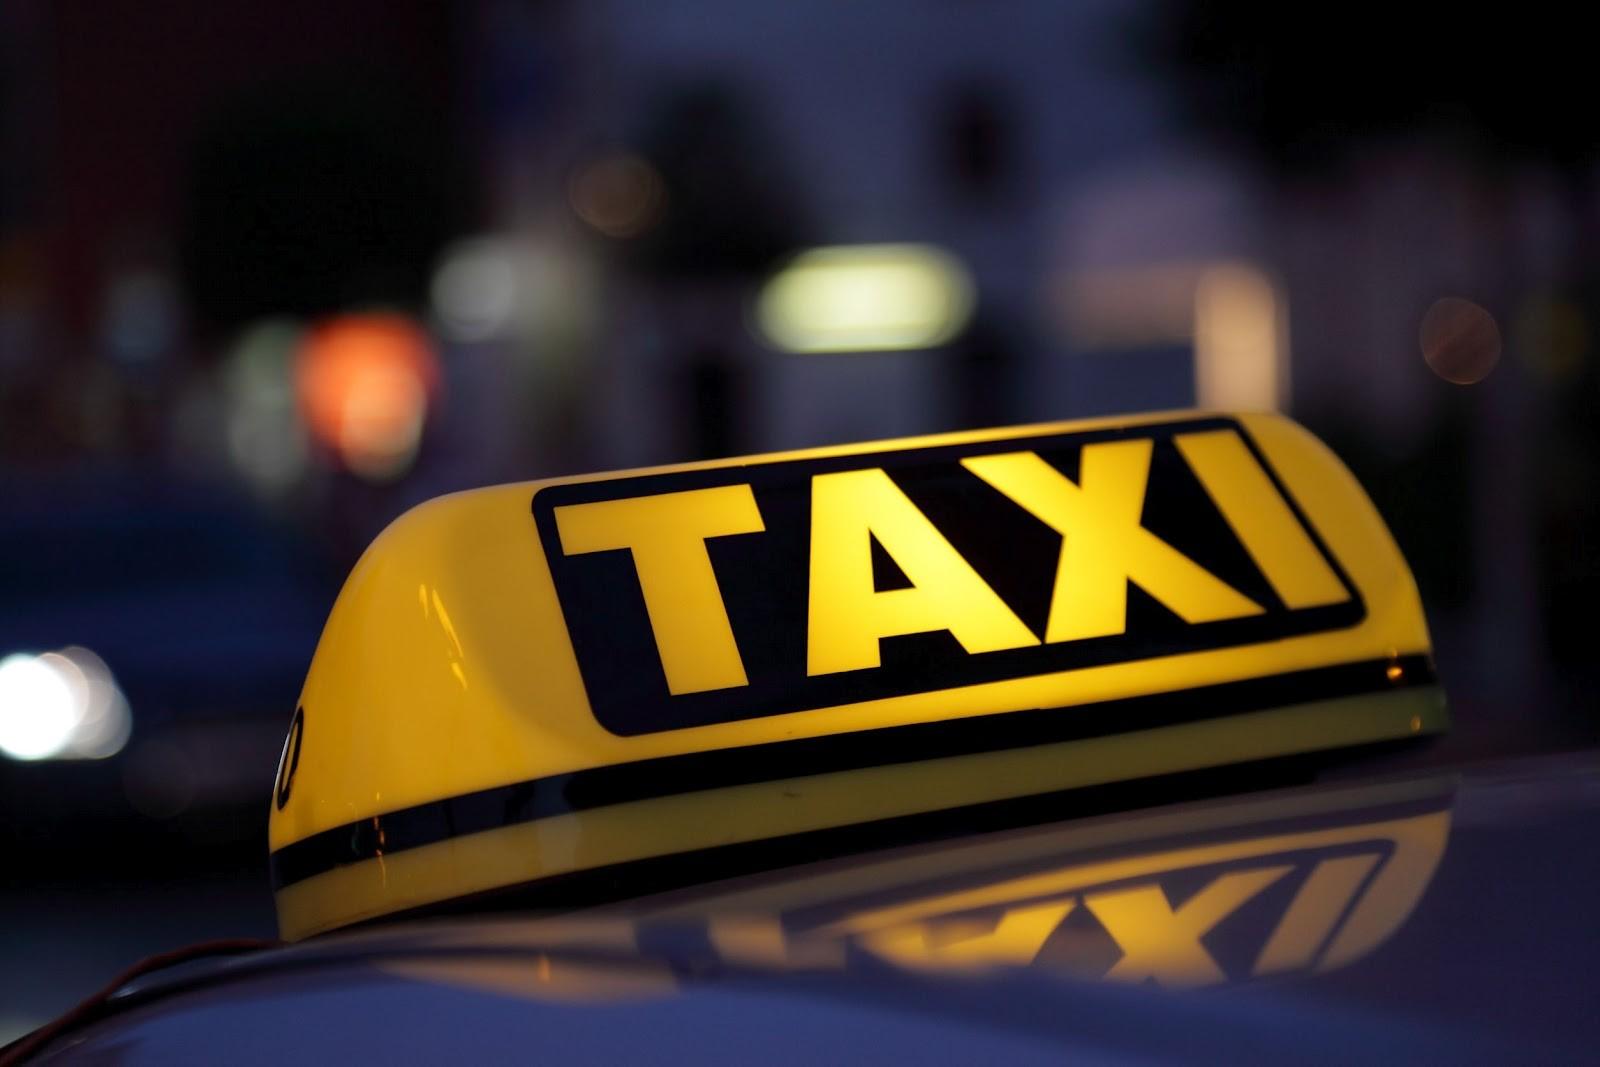 В столице таксист ранил пассажира ножом и исчез